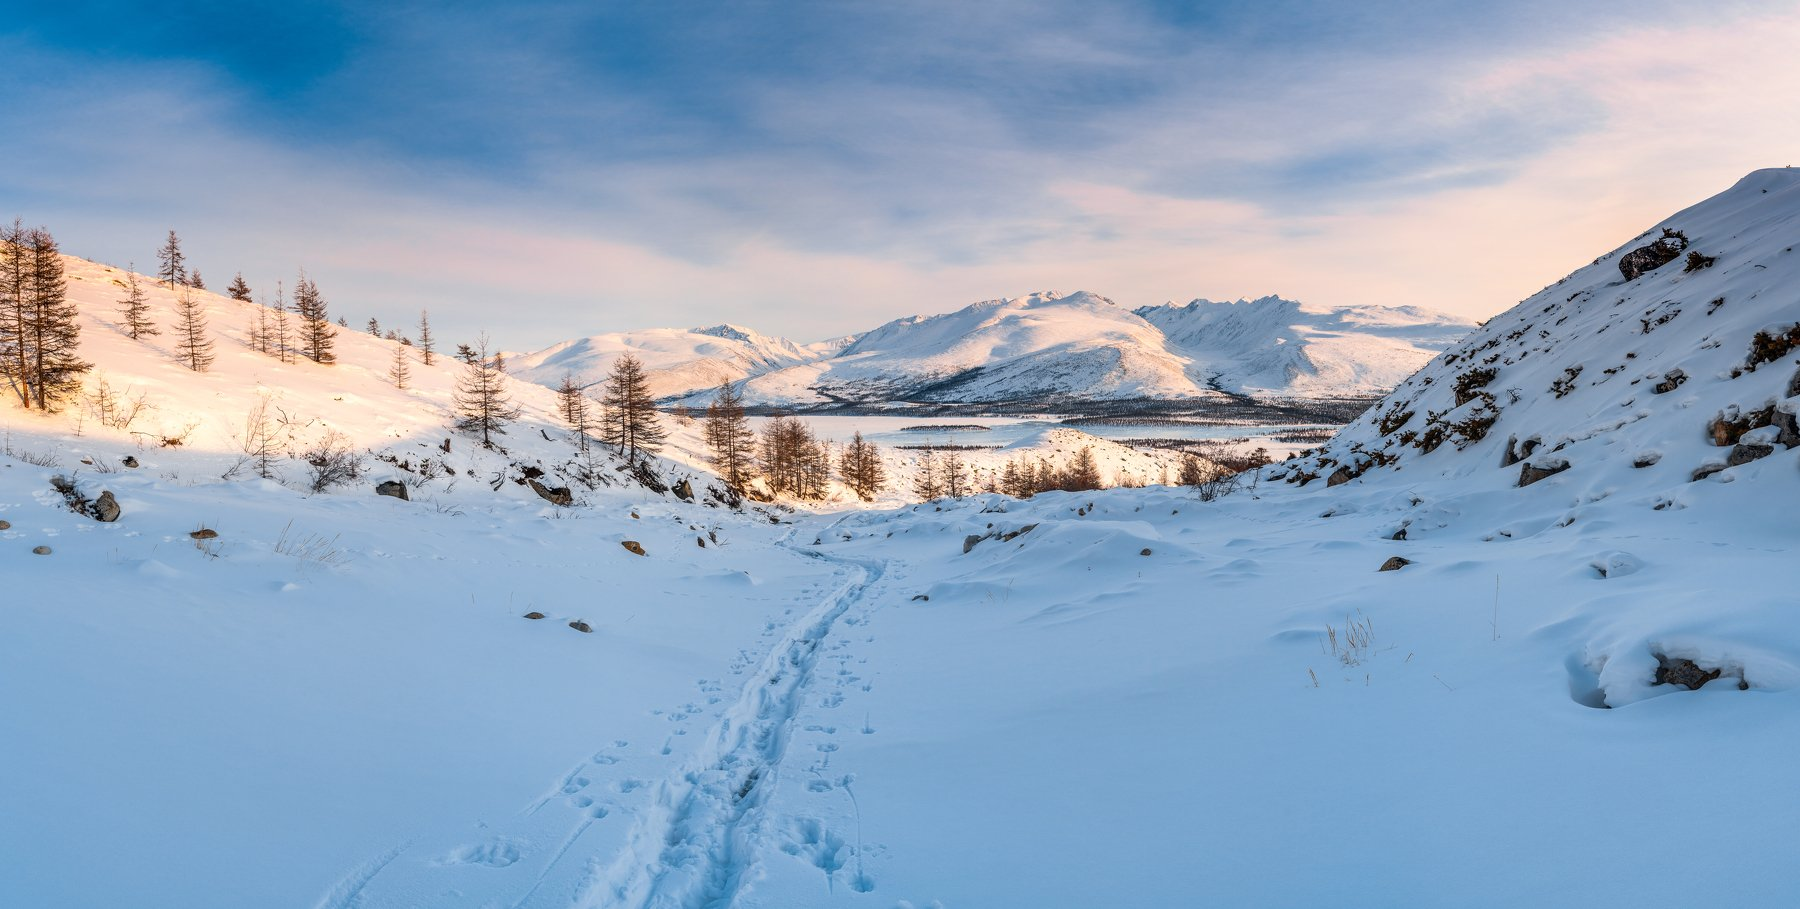 Якутия, хребет Черского, снег, зима, Evgeniy Khilkevitch